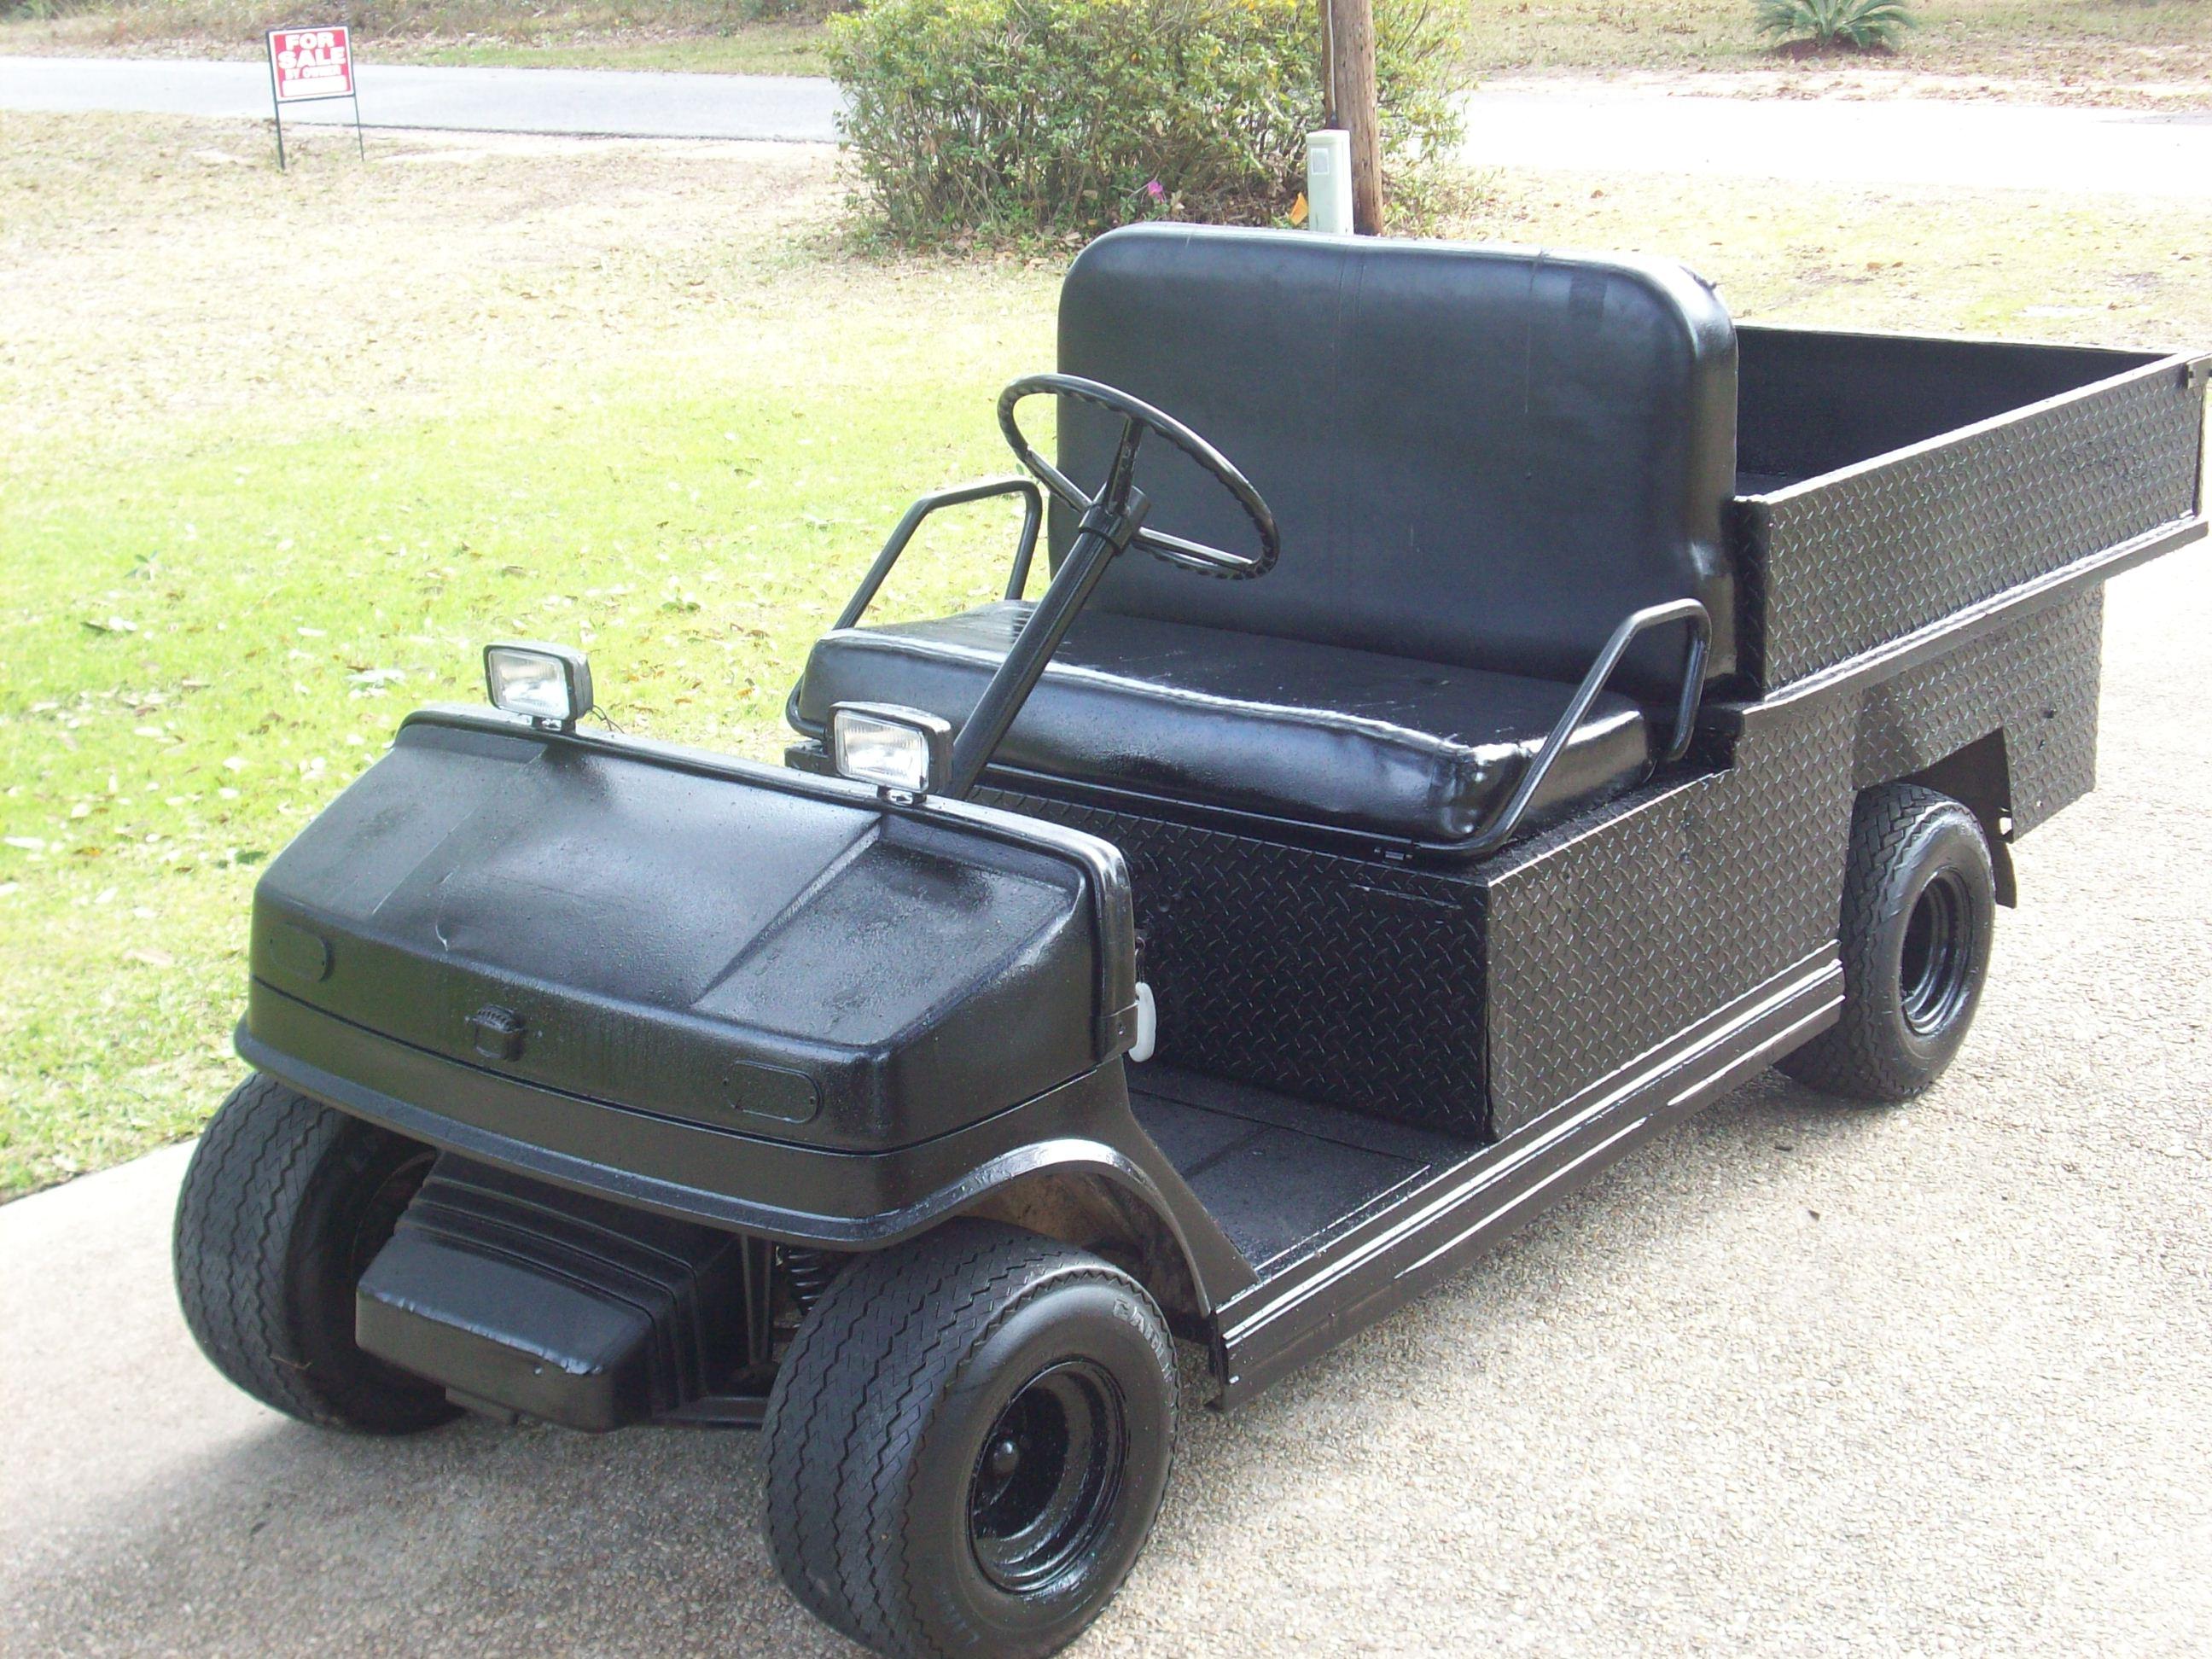 Modern Yamaha Golf Cart Wiring Diagram Gas Collection - Electrical on yamaha golf cart wheels, yamaha motorcycle wiring diagrams, yamaha golf cart turn signals, golf cart electrical system diagram, yamaha marine part 703-82563-02, yamaha golf cart serial number, yamaha wiring-diagram g29, yamaha g1 golf cart, yamaha golf cart parts, yamaha g2 golf cart, yamaha ydre wiring-diagram, yamaha electric golf cart, club car wiring diagram, yamaha parts diagram, yamaha golf cart generator, yamaha golf cars, yamaha g9 wiring-diagram, yamaha xs650 wiring-diagram, yamaha g9 golf cart, yamaha golf cart repair manual,